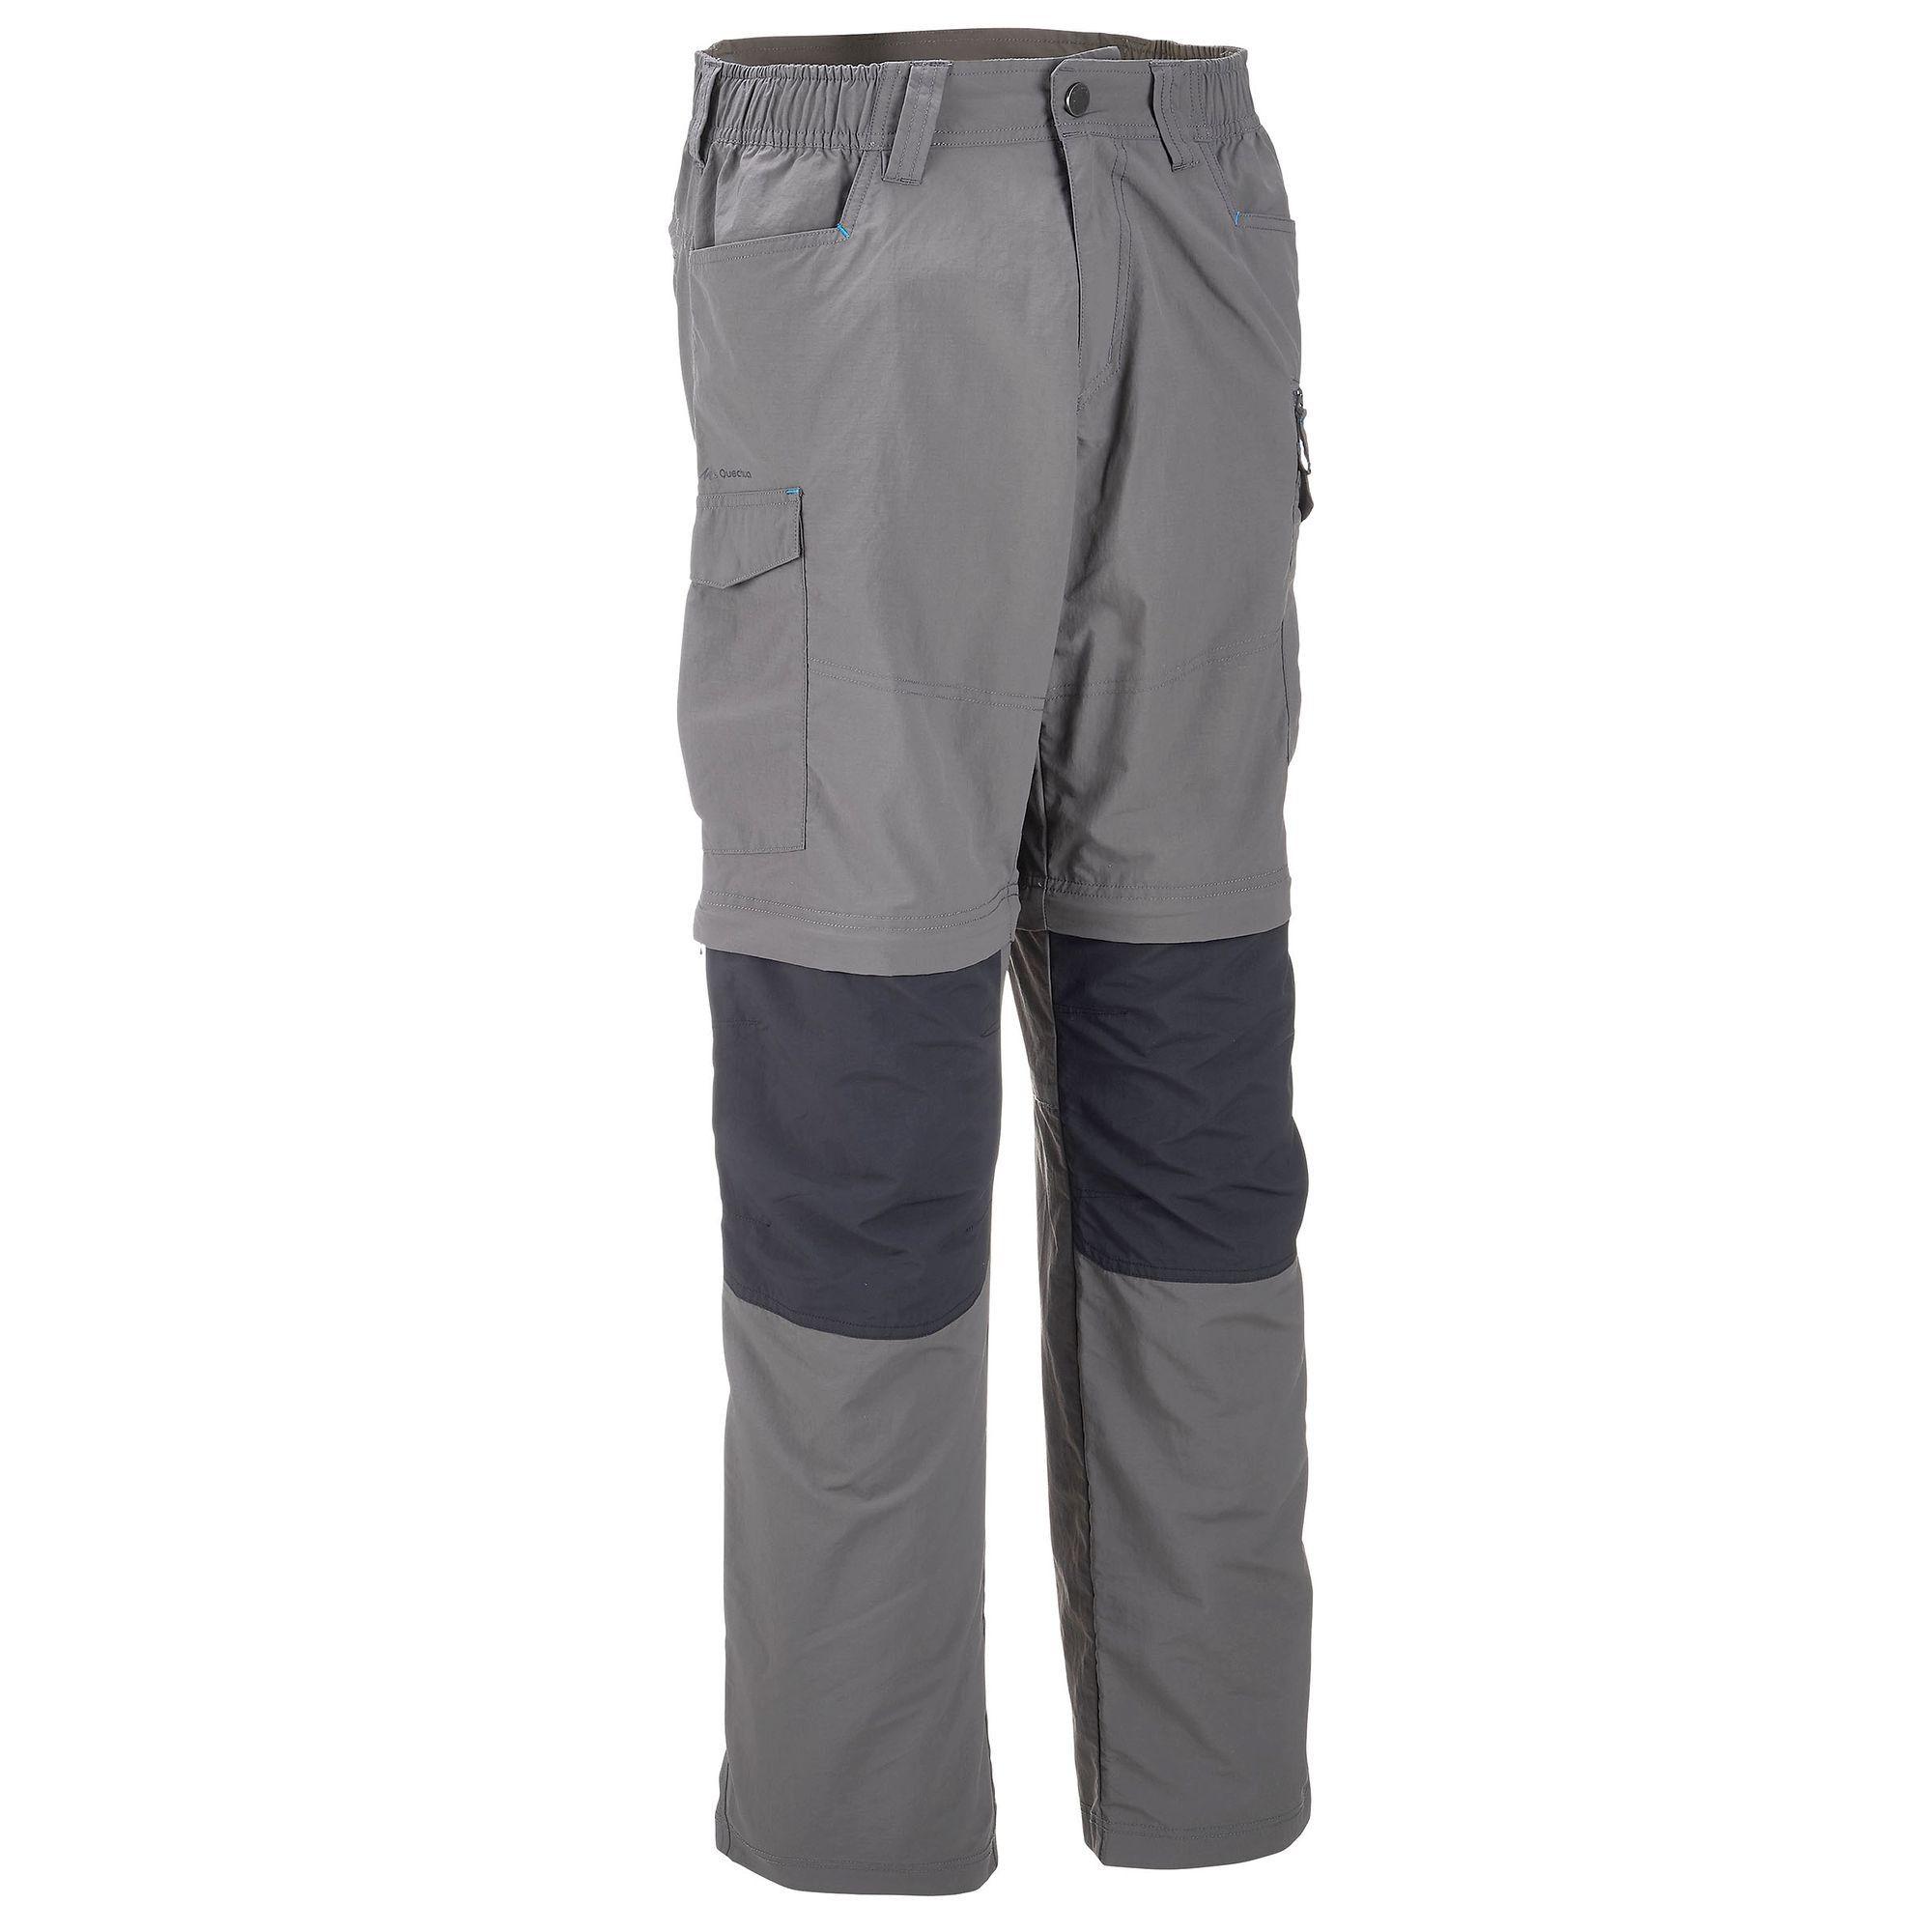 Sort Kapri Pantolon Tisort Gomlek Forclaz 100 Erkek Pantolonu Pantolon Tisort Gomlek